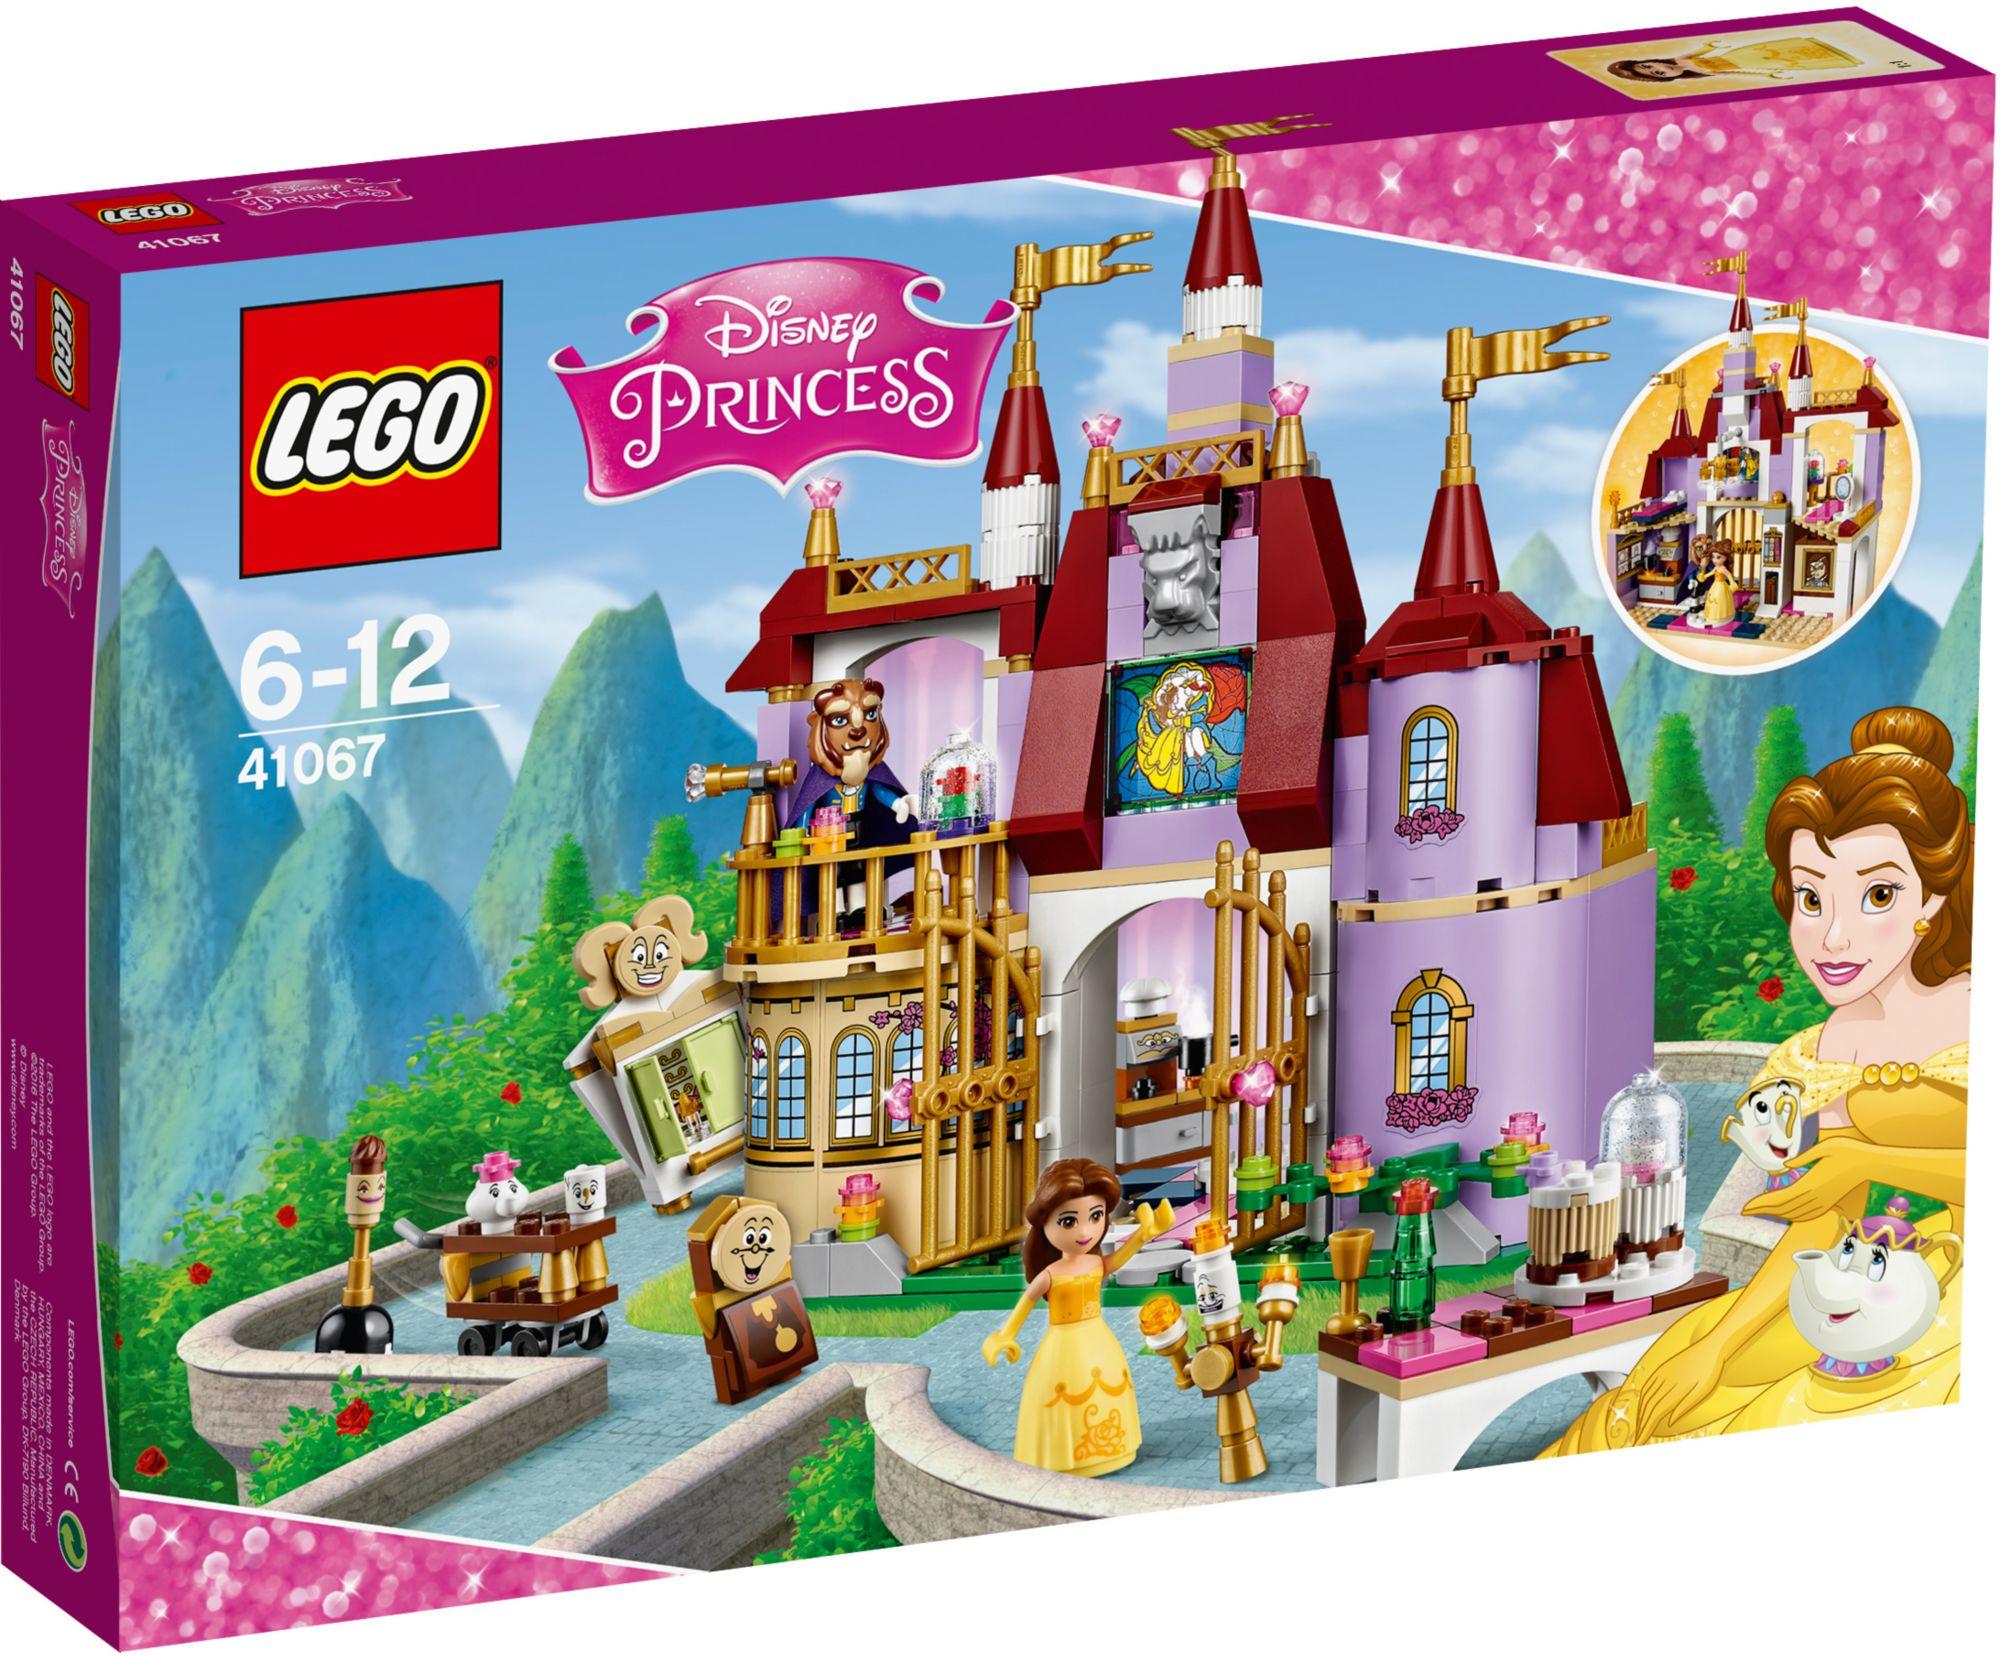 LEGO® 41067 Disney Princess Belles bezauberndes Schloss, Konstruktionsspielzeug